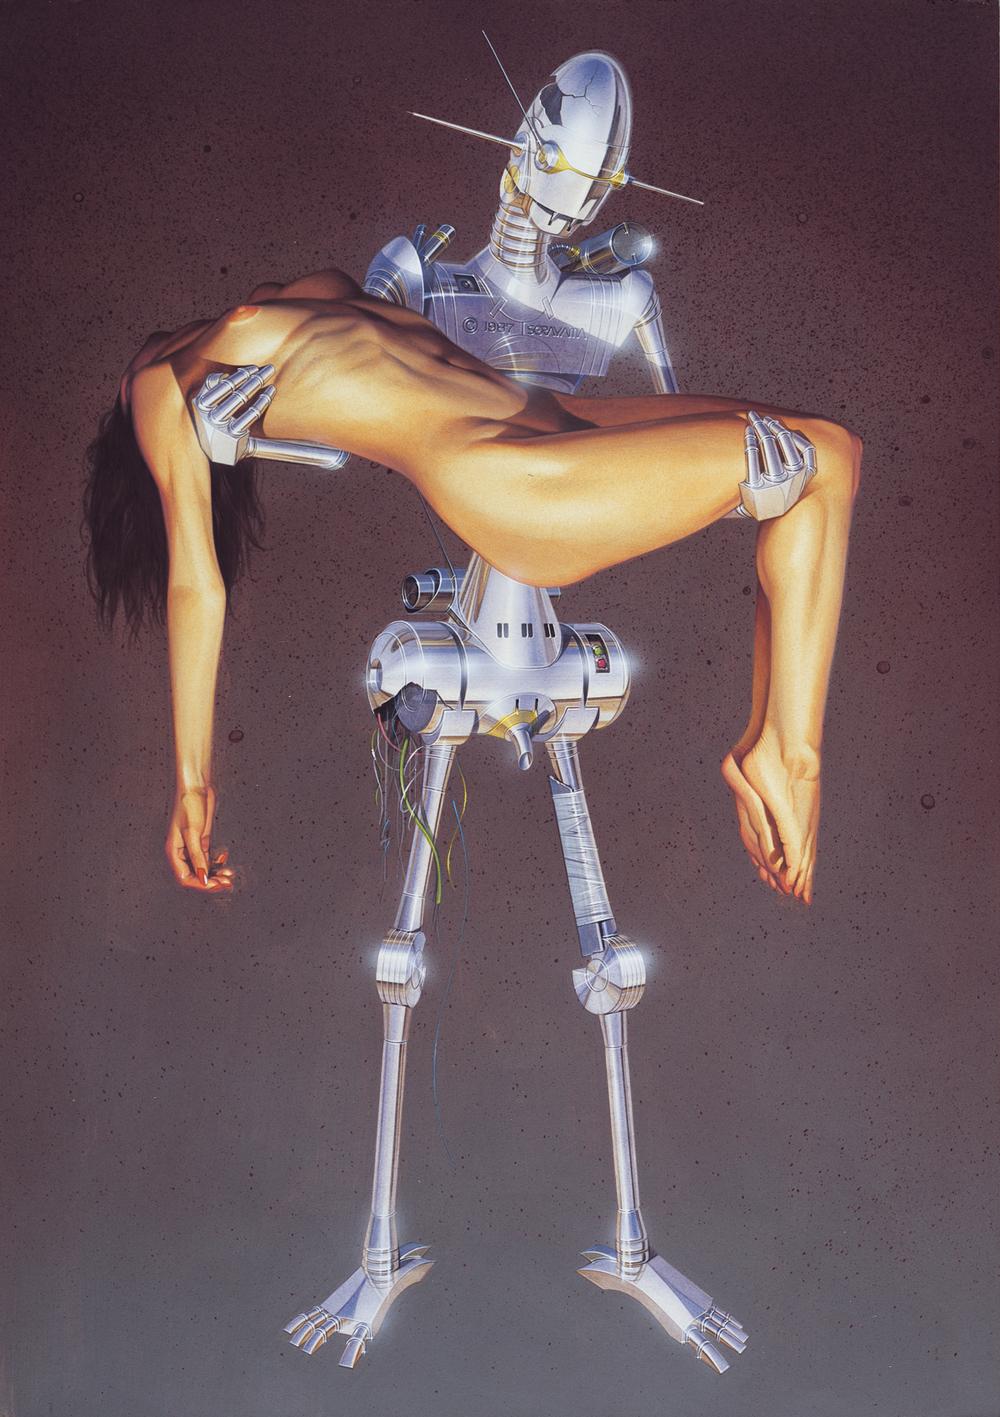 Hajime-Sorayama-Upper-Playground-Fifty24SF-Sexy-Robot-GIGANTES-009